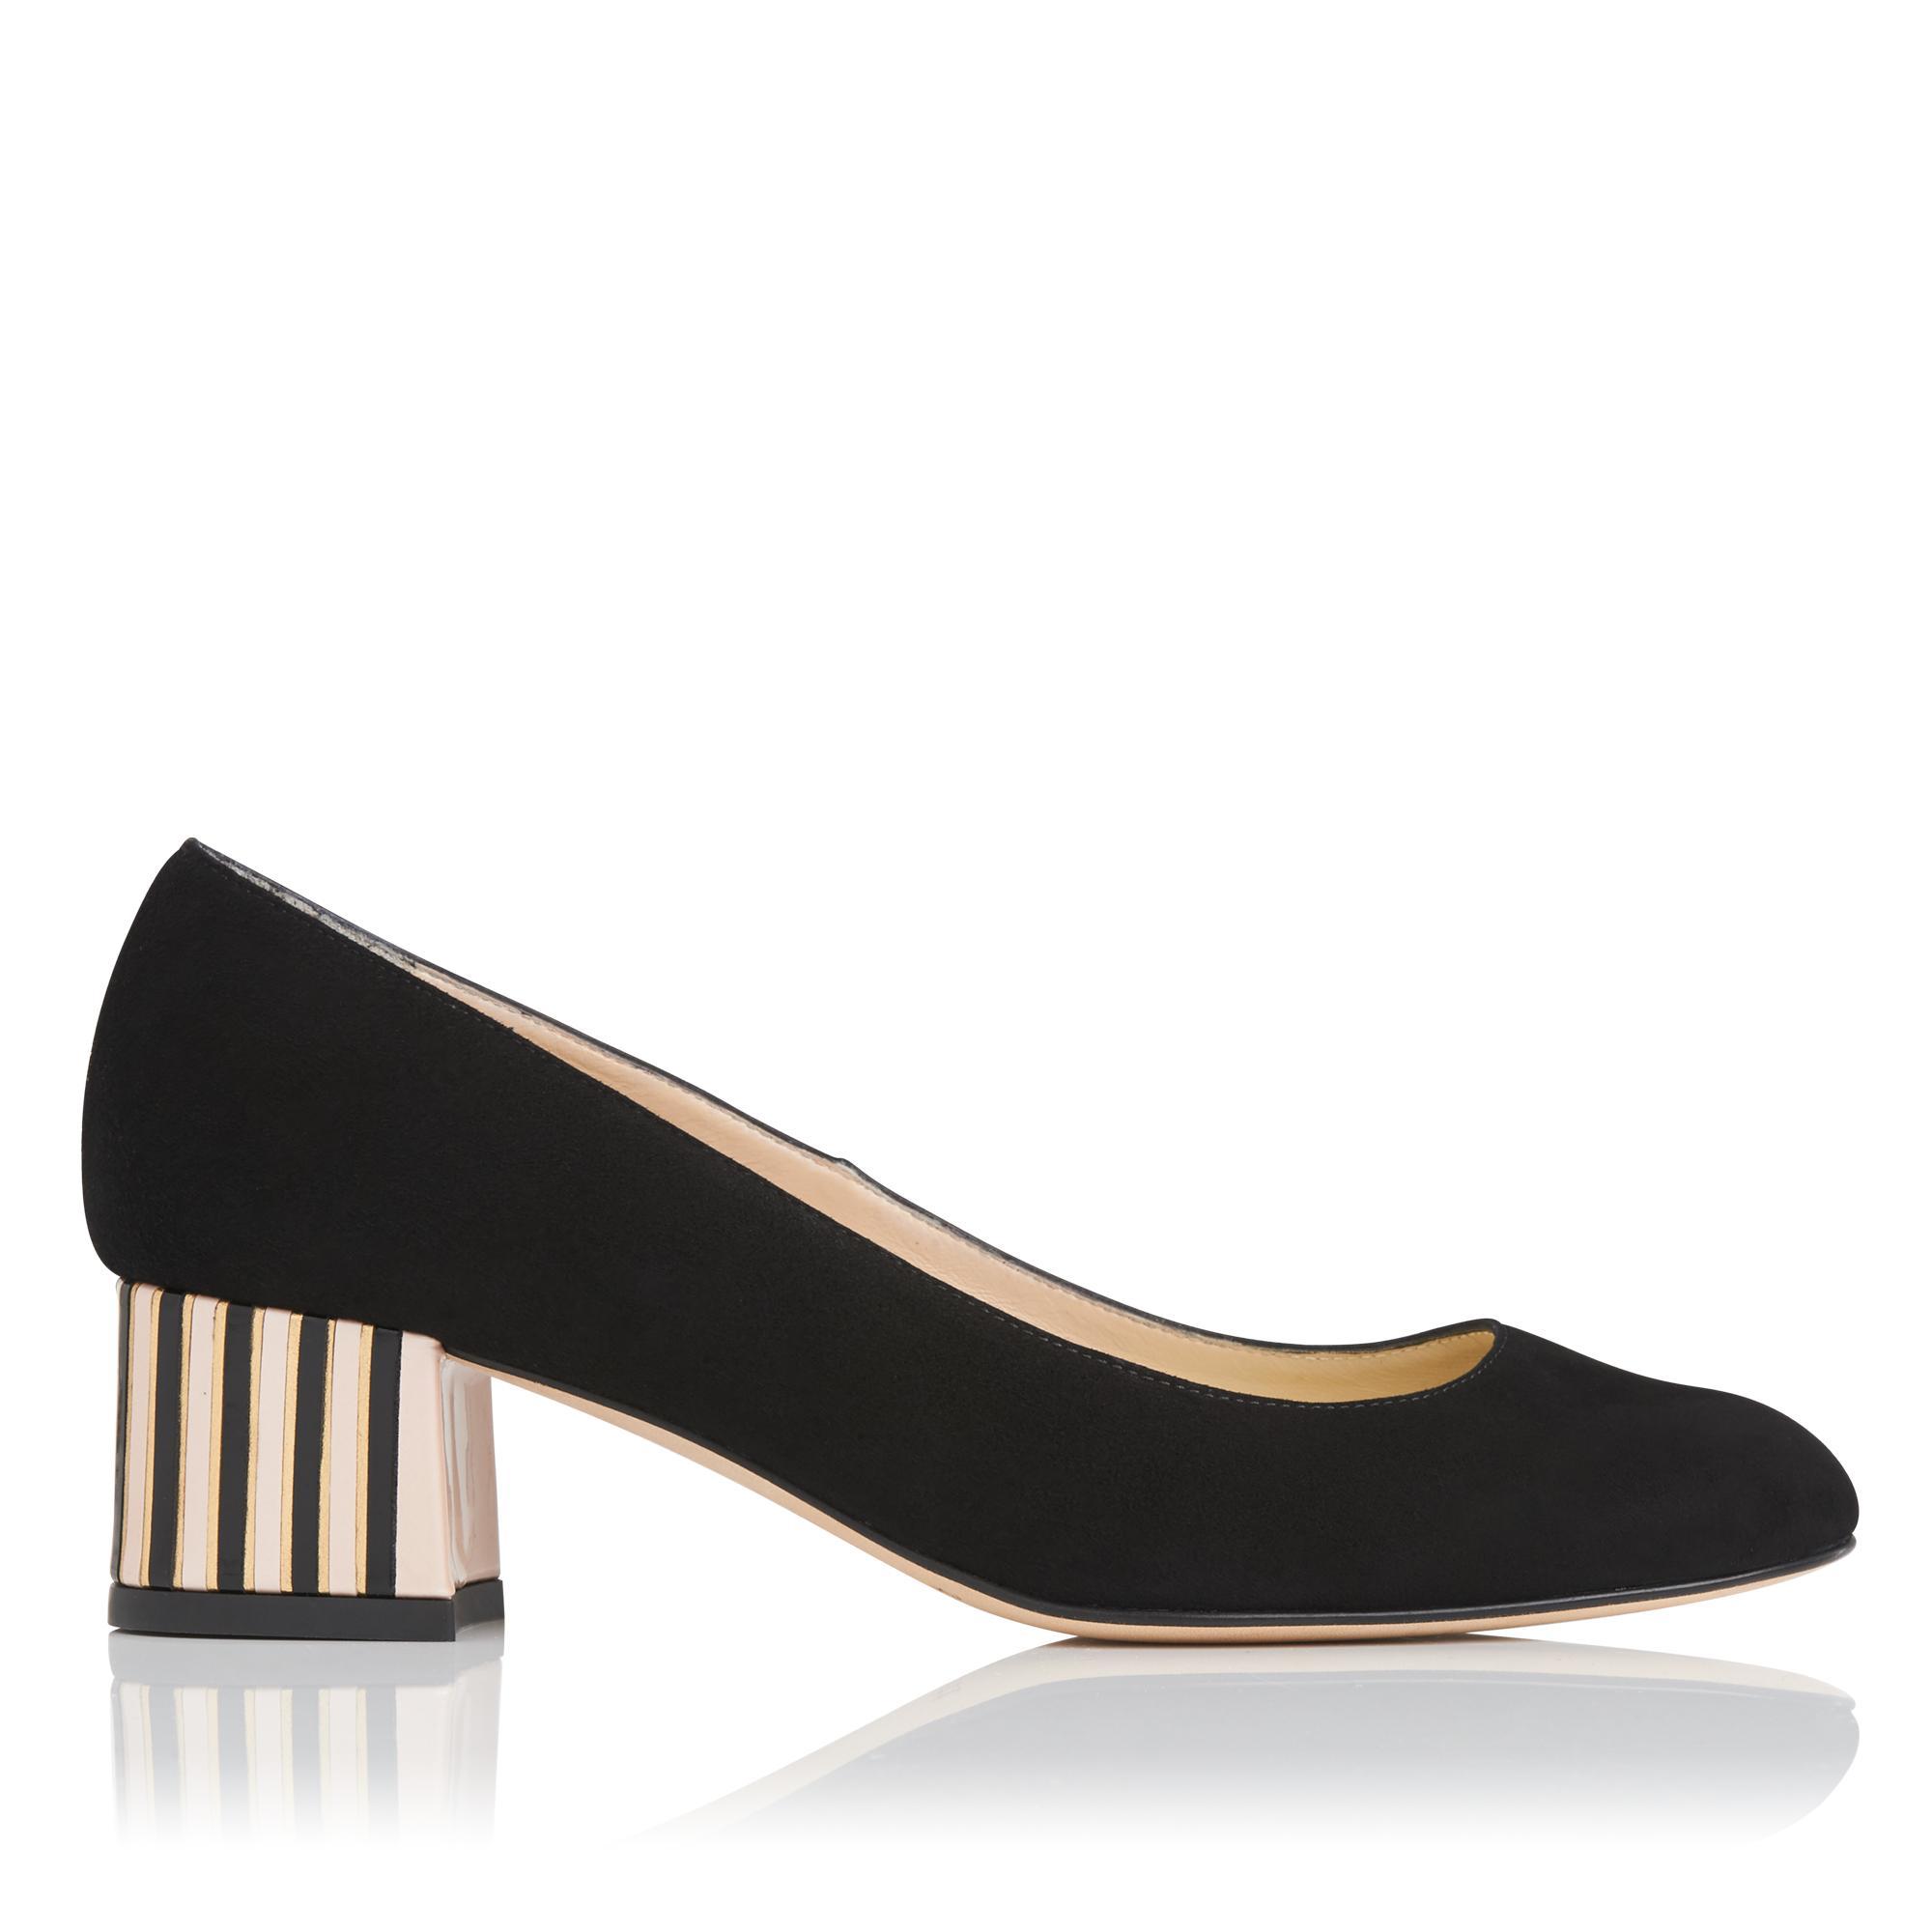 Maisy Black Suede Heel